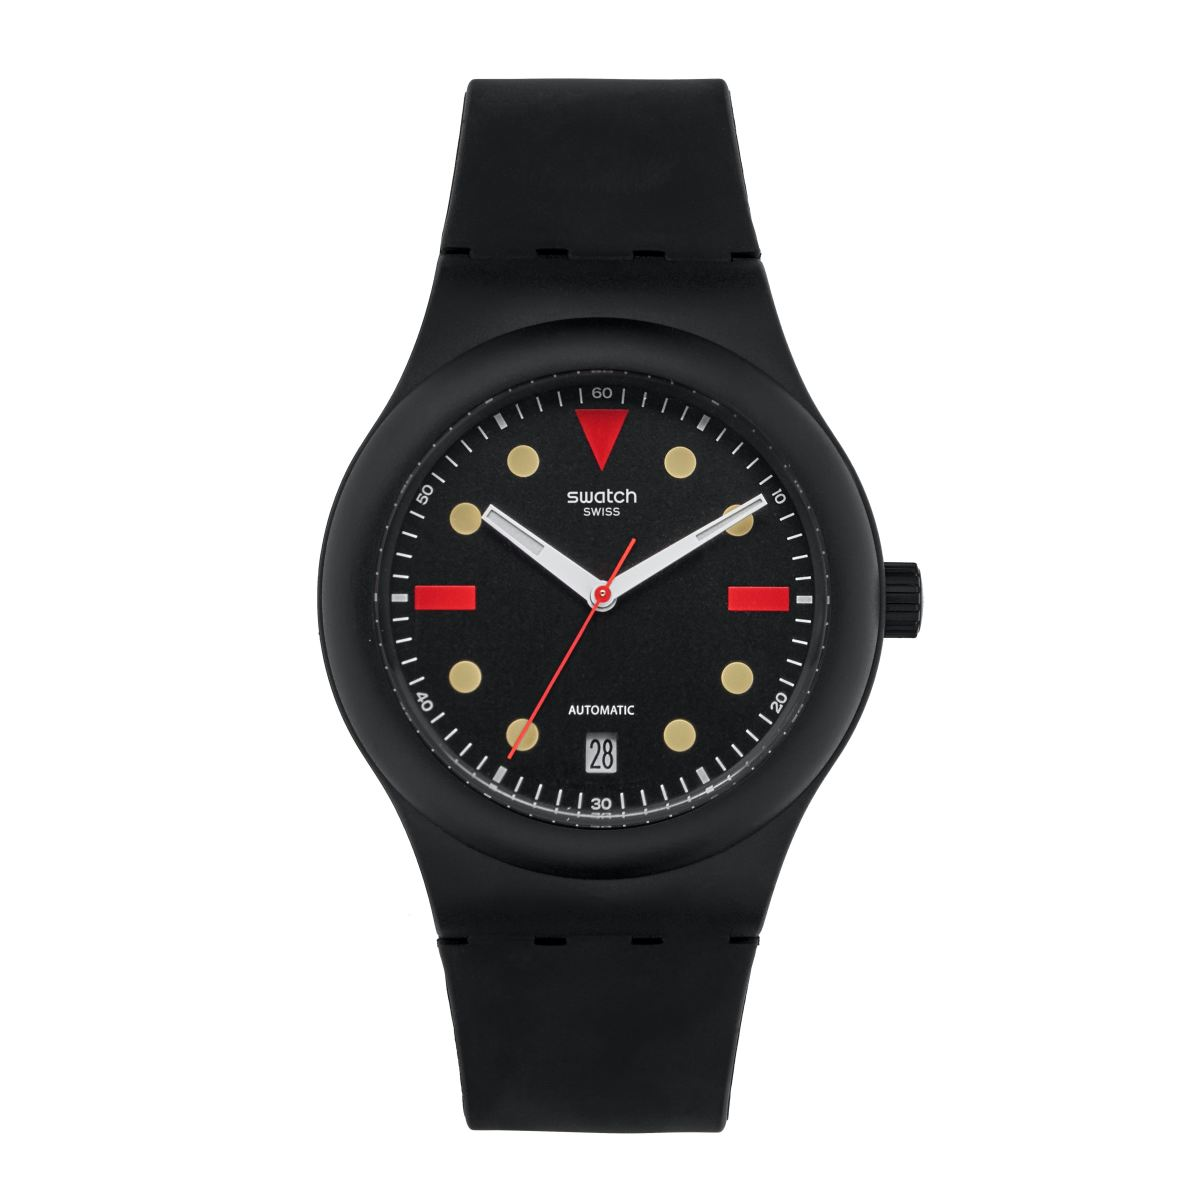 Hodinkee Swatch Sistem51 Generation 1986